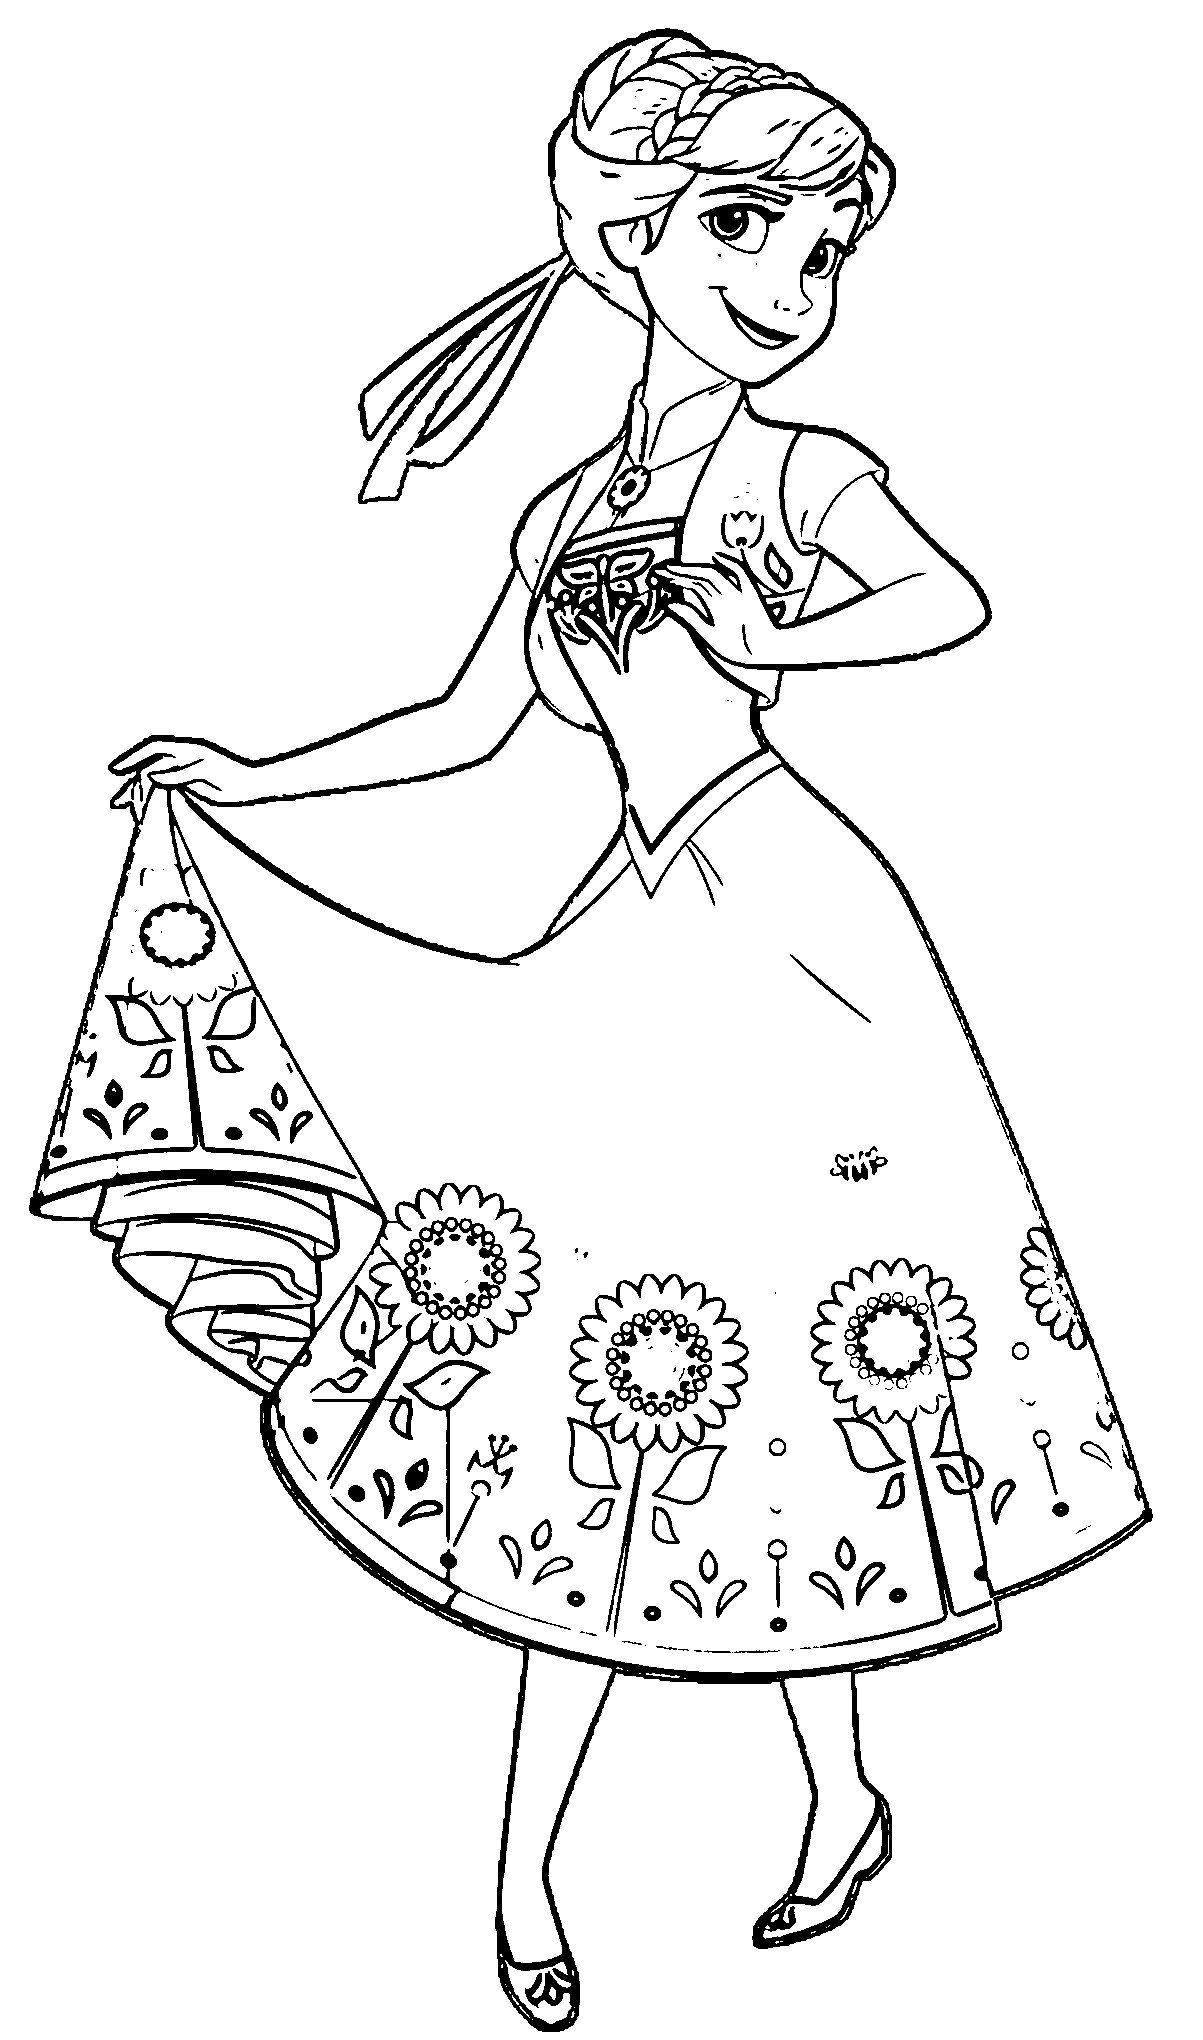 Frozen Coloring Books For Kids Remarkable Disney Frozen Coloring Book Lets Walmart Stores En 2020 Colorear Princesas Disney Frozen Para Colorear Colorear Princesas